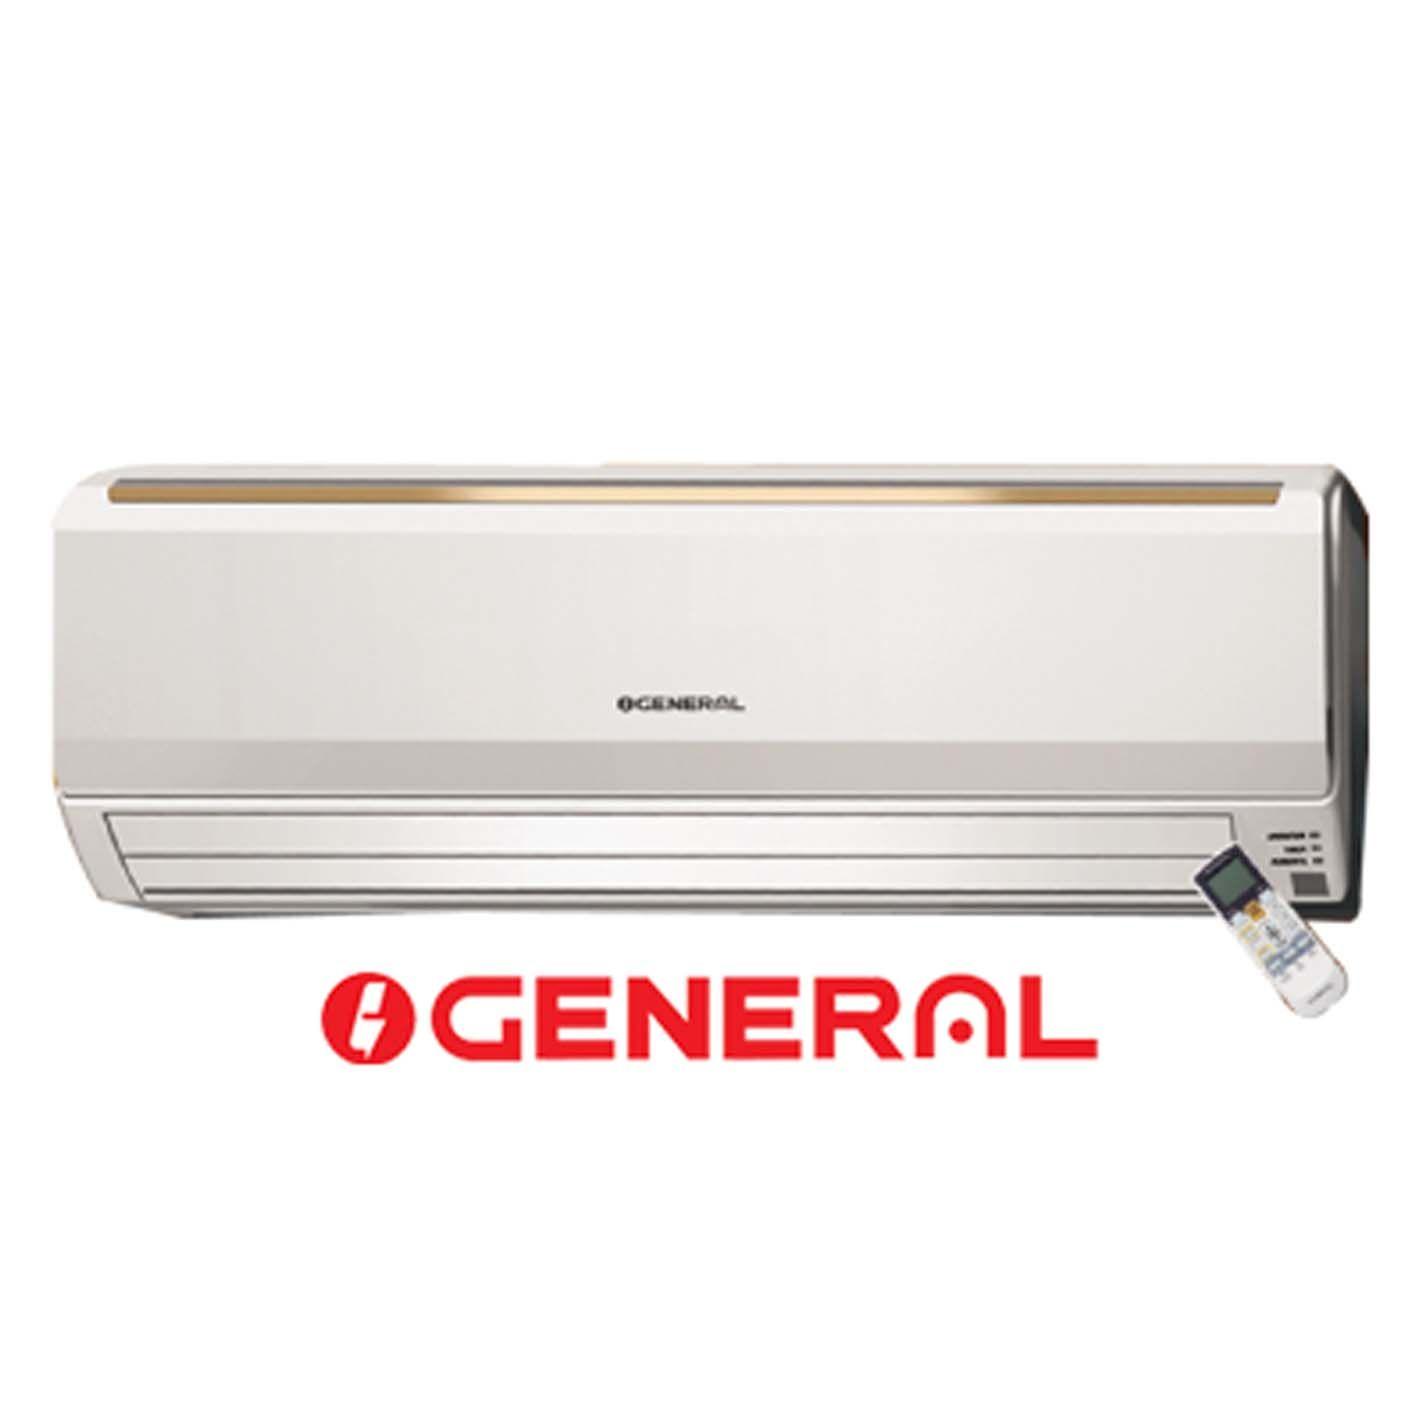 General Asga24aet 2 Ton Air Conditioner Price In Bangladesh Ac Mart Bd Air Conditioner Prices Ac Price Air Cooler